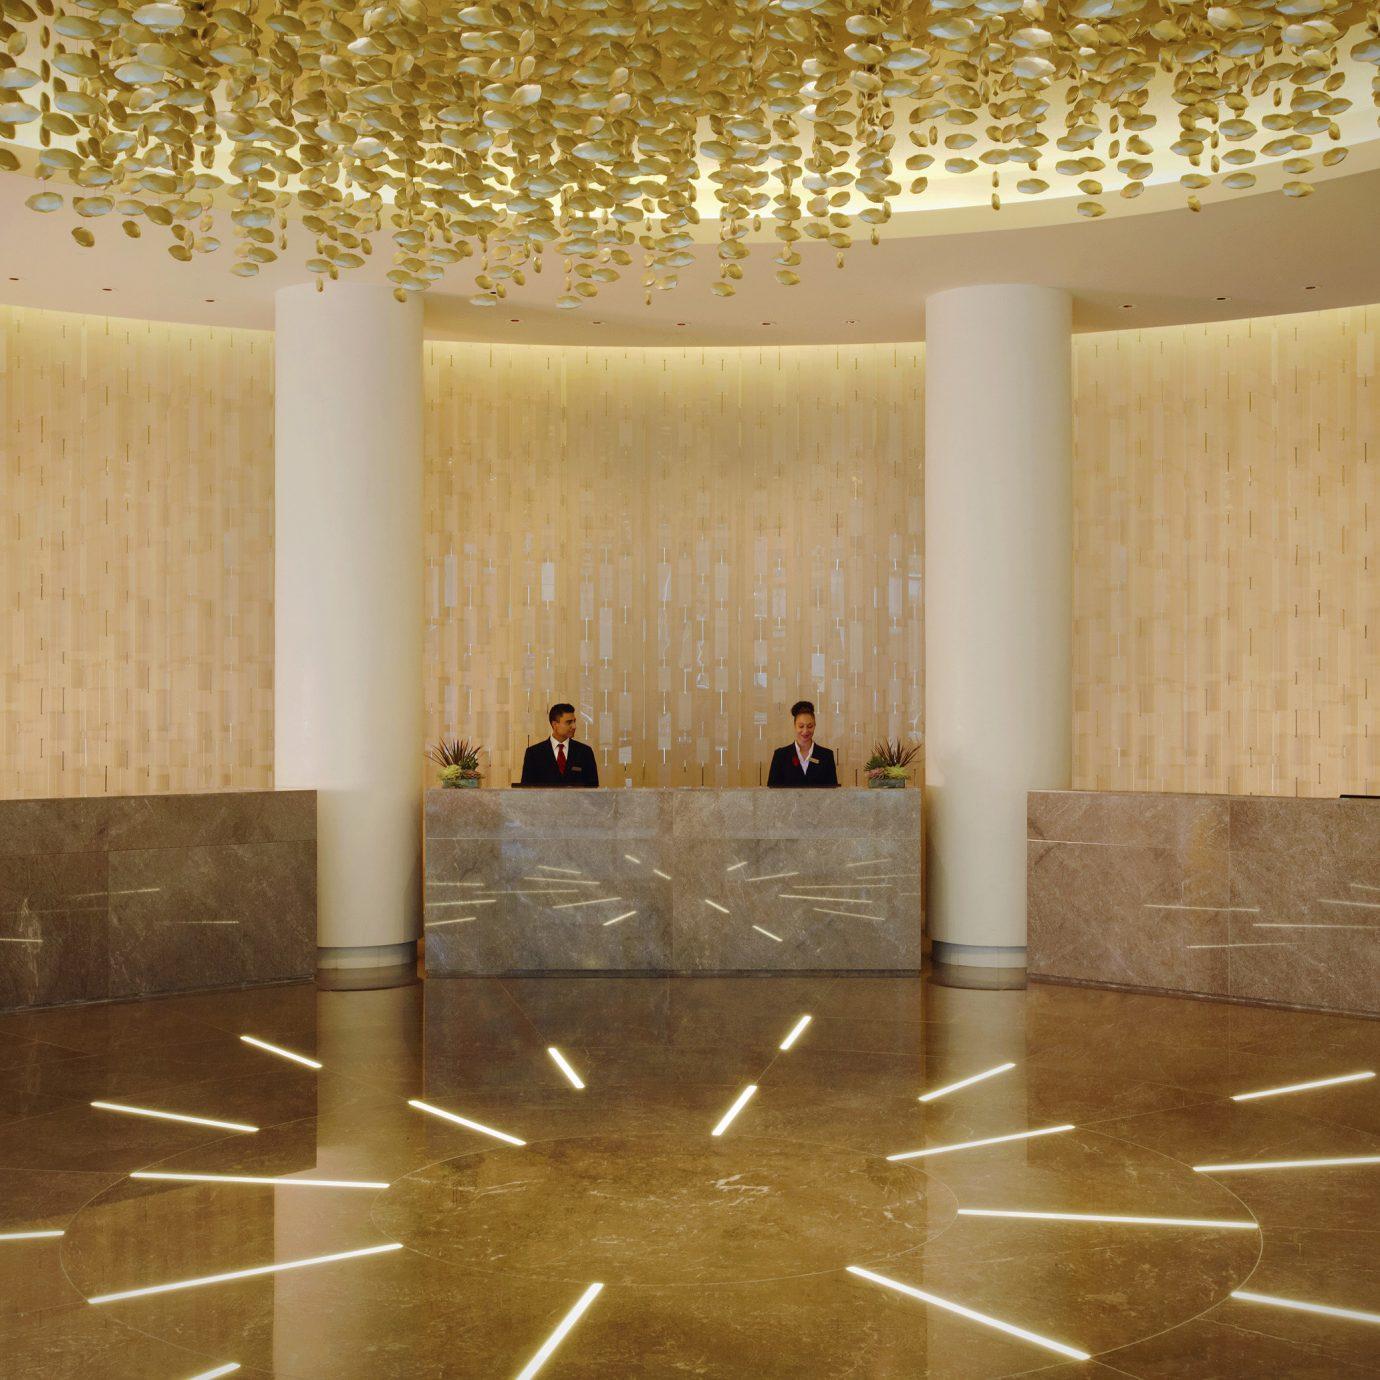 function hall Lobby Architecture flooring lighting daylighting ballroom hall